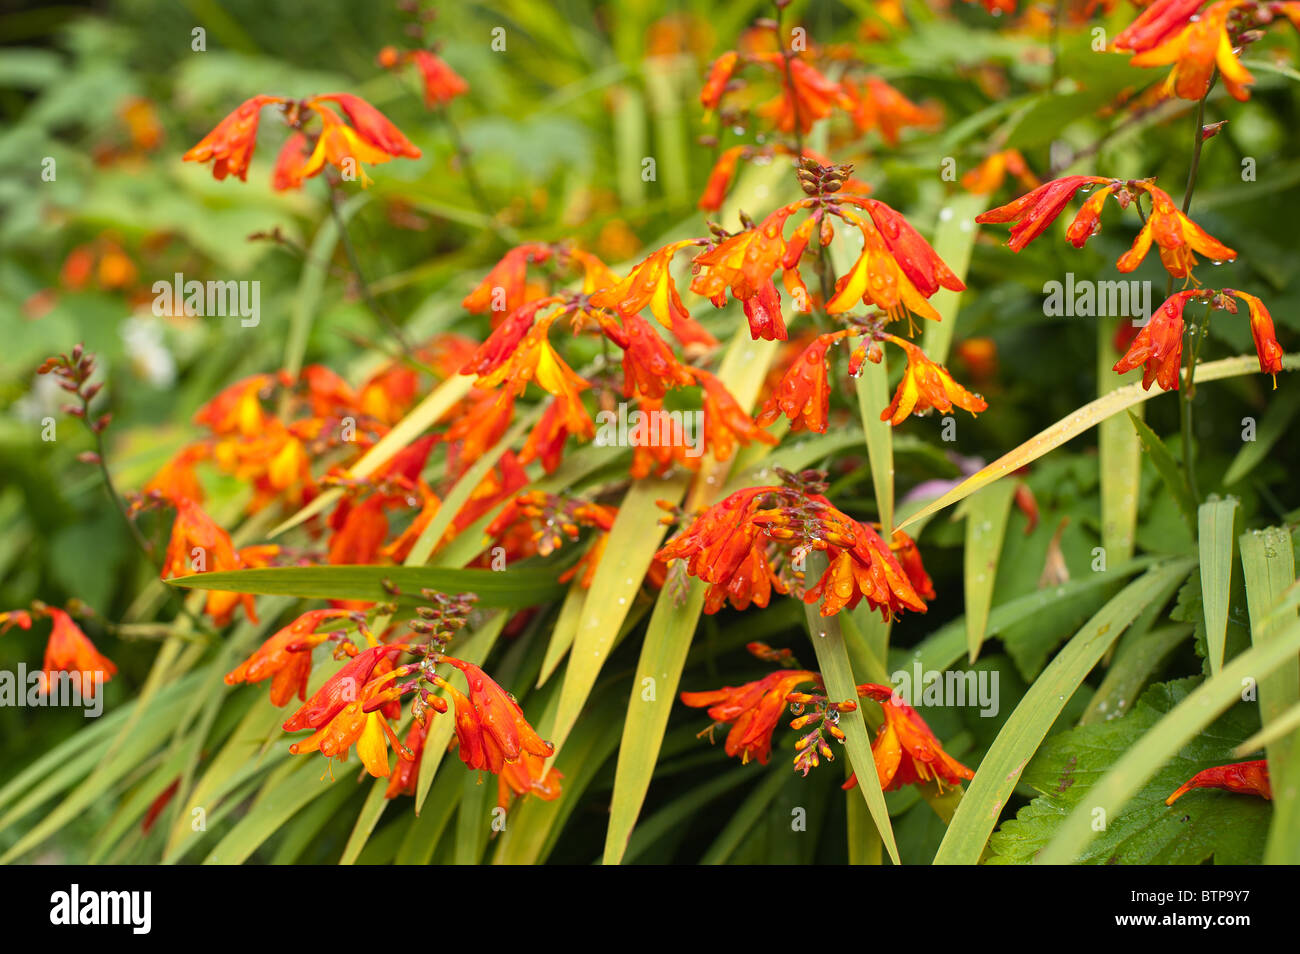 montbretia Crocosmia perennial genusiris family Iridaceae native to grasslands of Cape Floristic Region South Africa Stock Photo